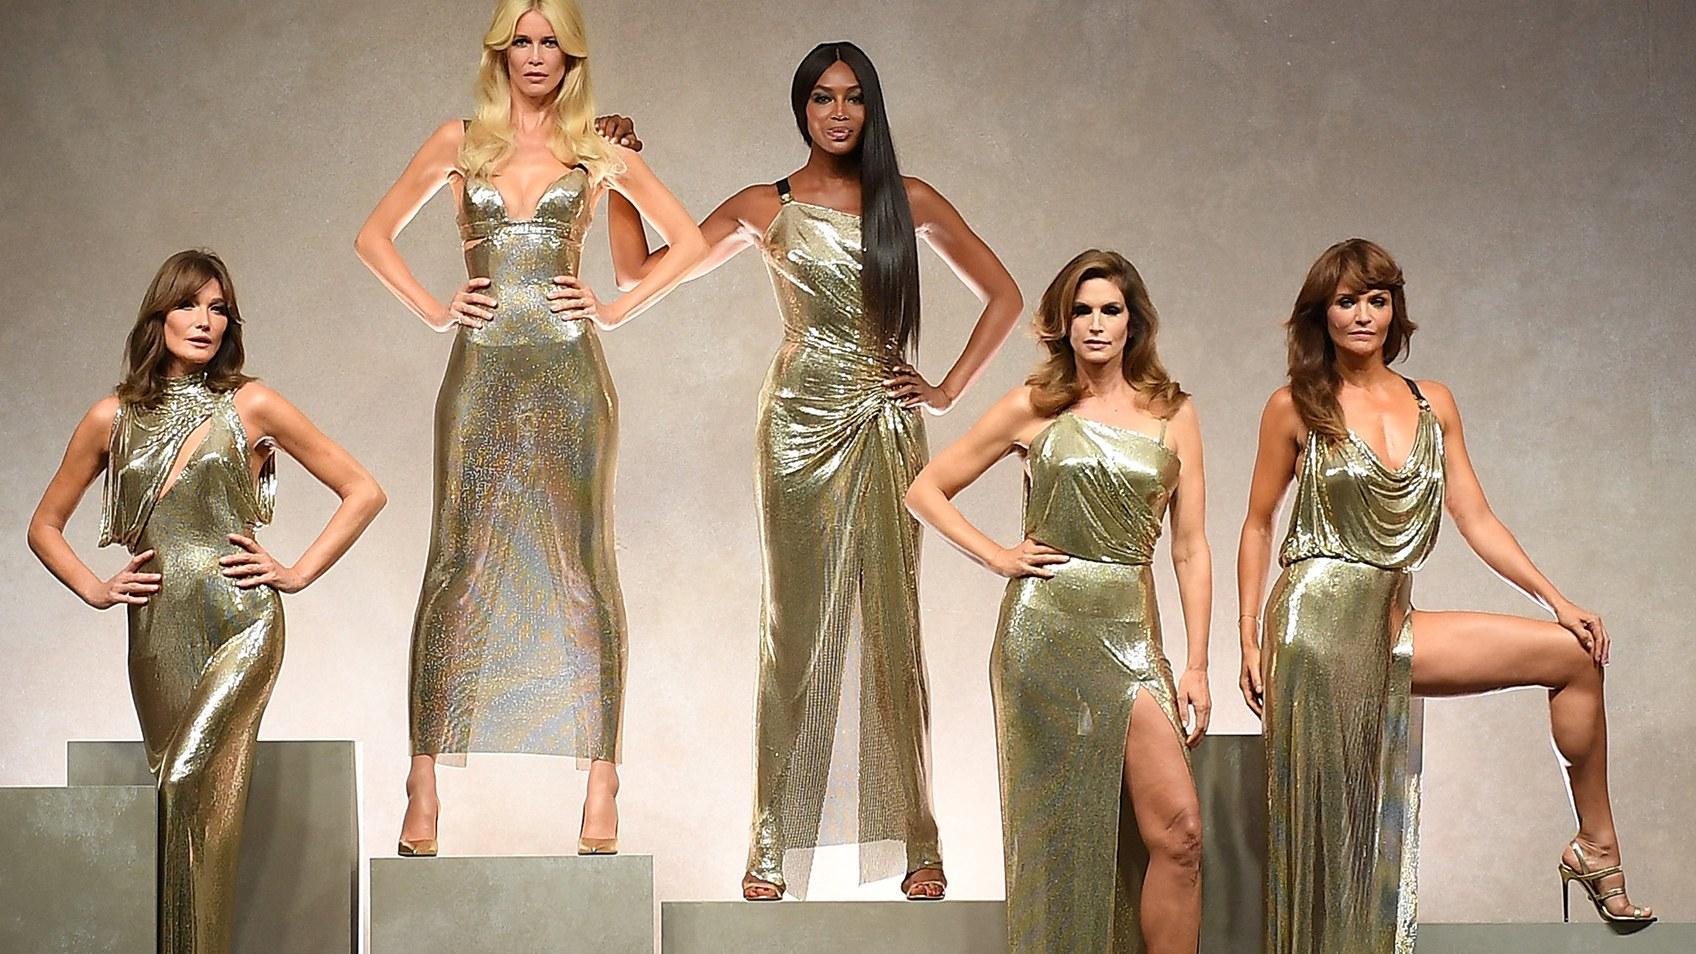 """Gianni's Girls"" from left: Carli Bruni, Claudia Schiffer, Naomi Campbell, Cindy Crawford &Helena Christensen. Photo: Vogue"